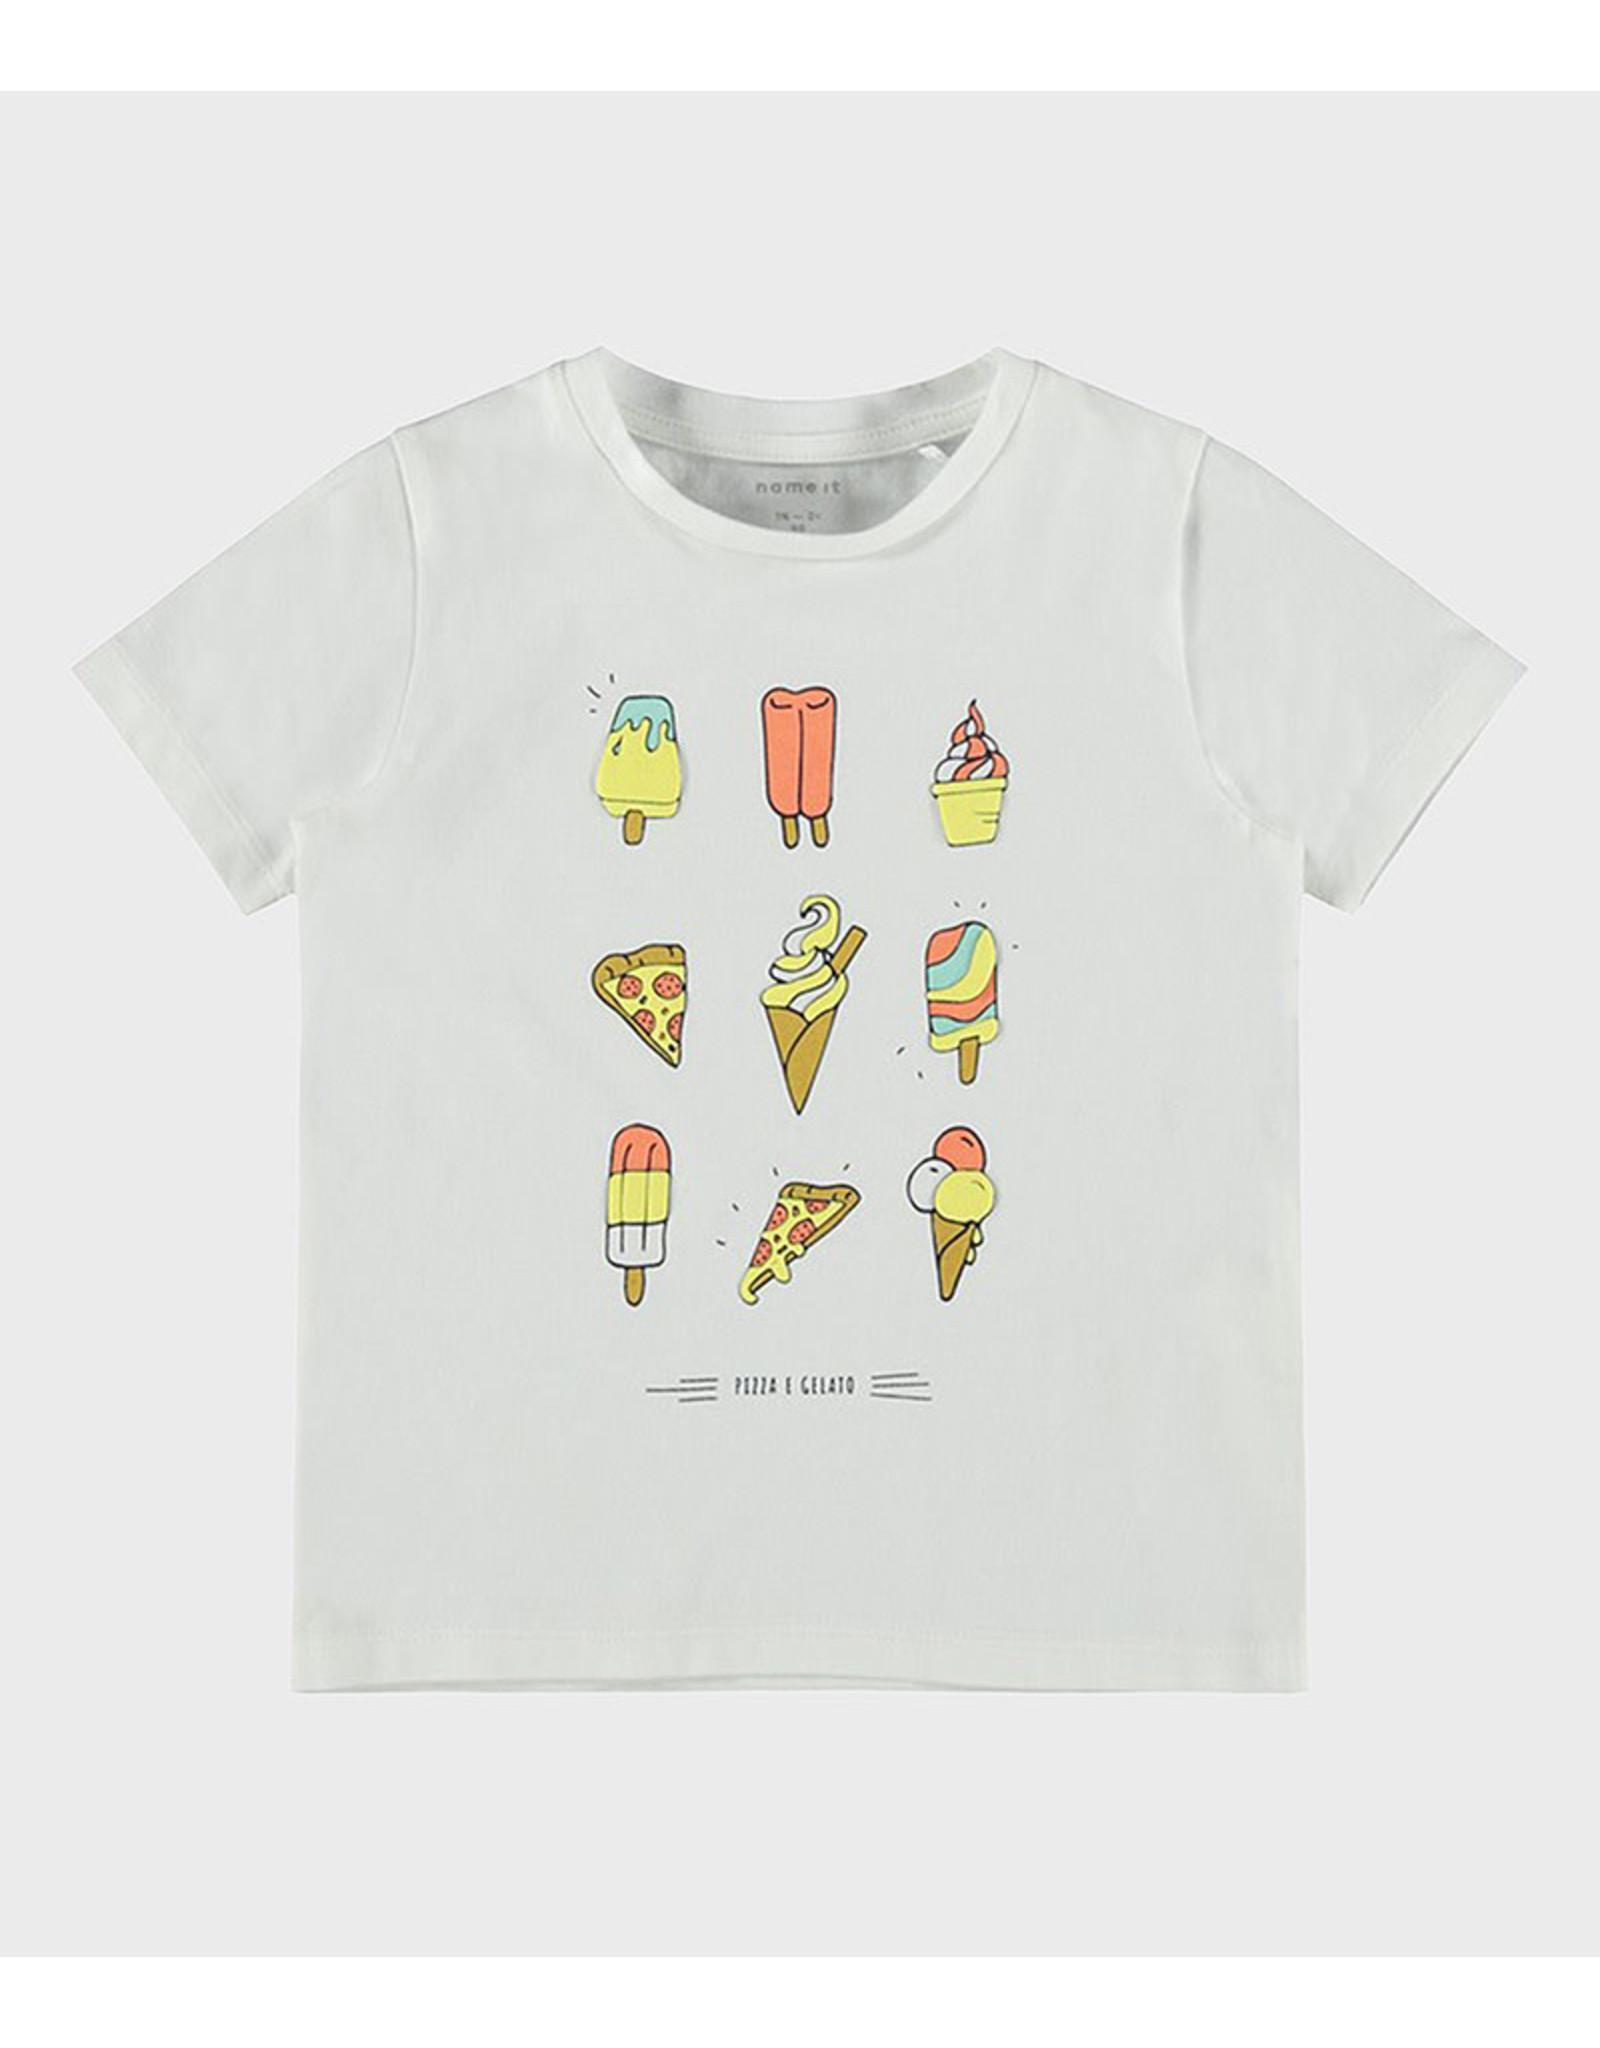 Name It Witte unisex t-shirt met pizza's en ijsjes